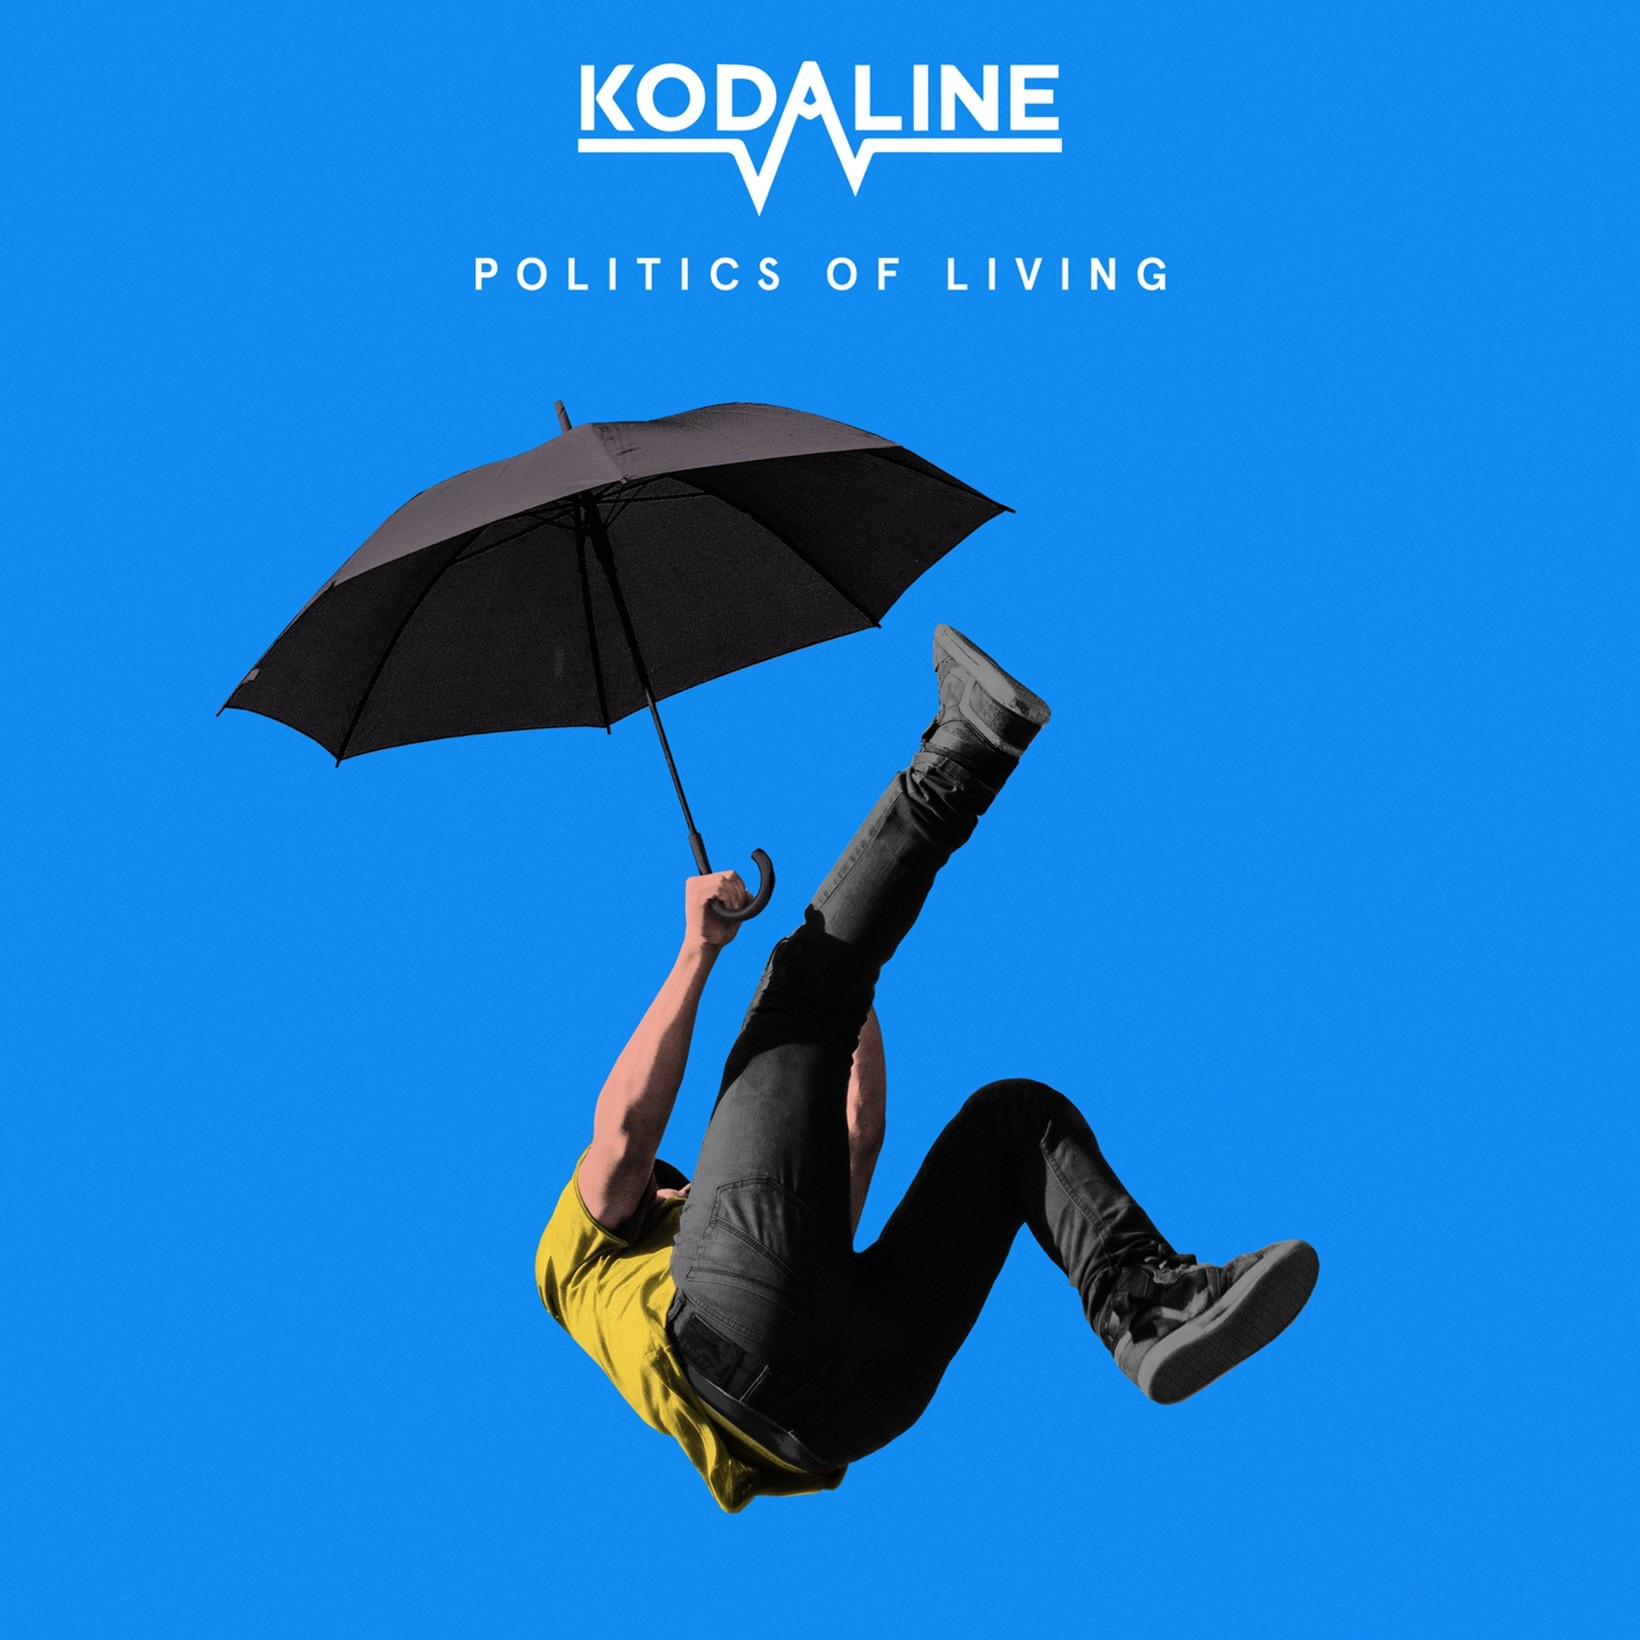 Politics of Living